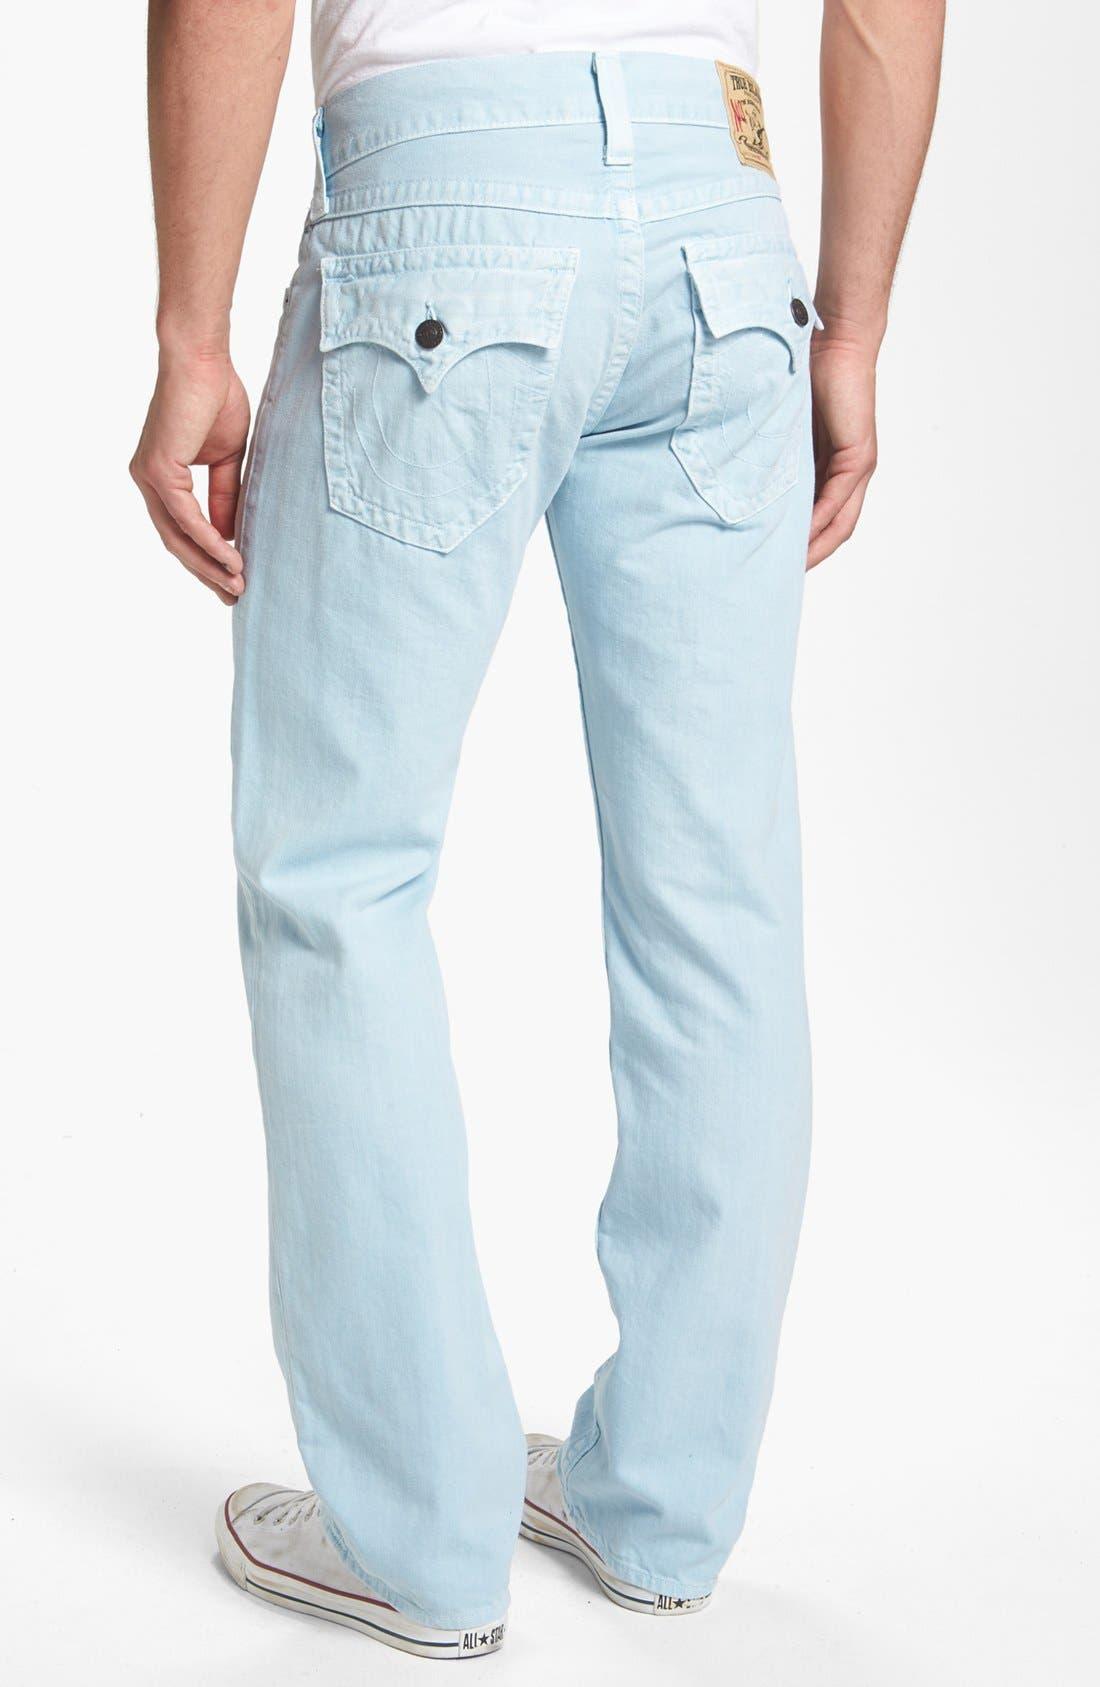 Alternate Image 1 Selected - True Religion Brand Jeans 'Ricky' Straight Leg Pants